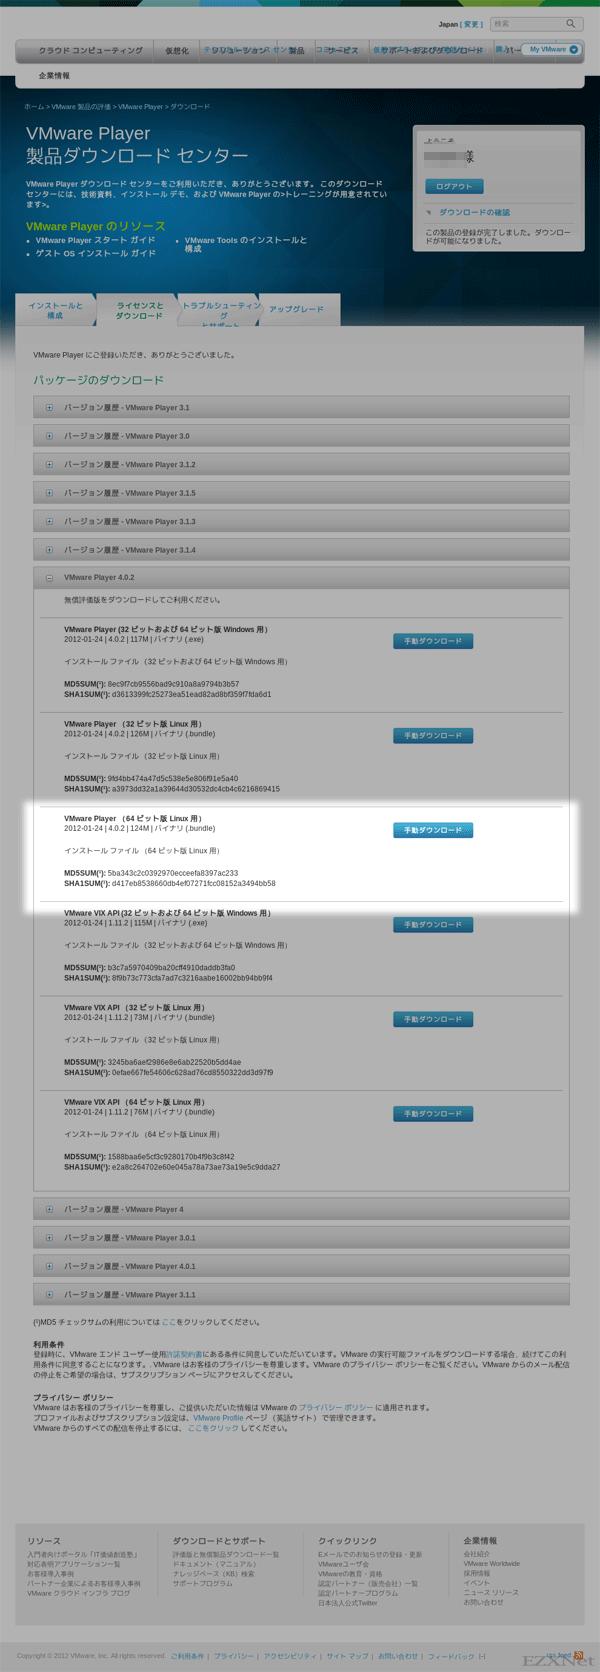 VMware Playerのダウンロード